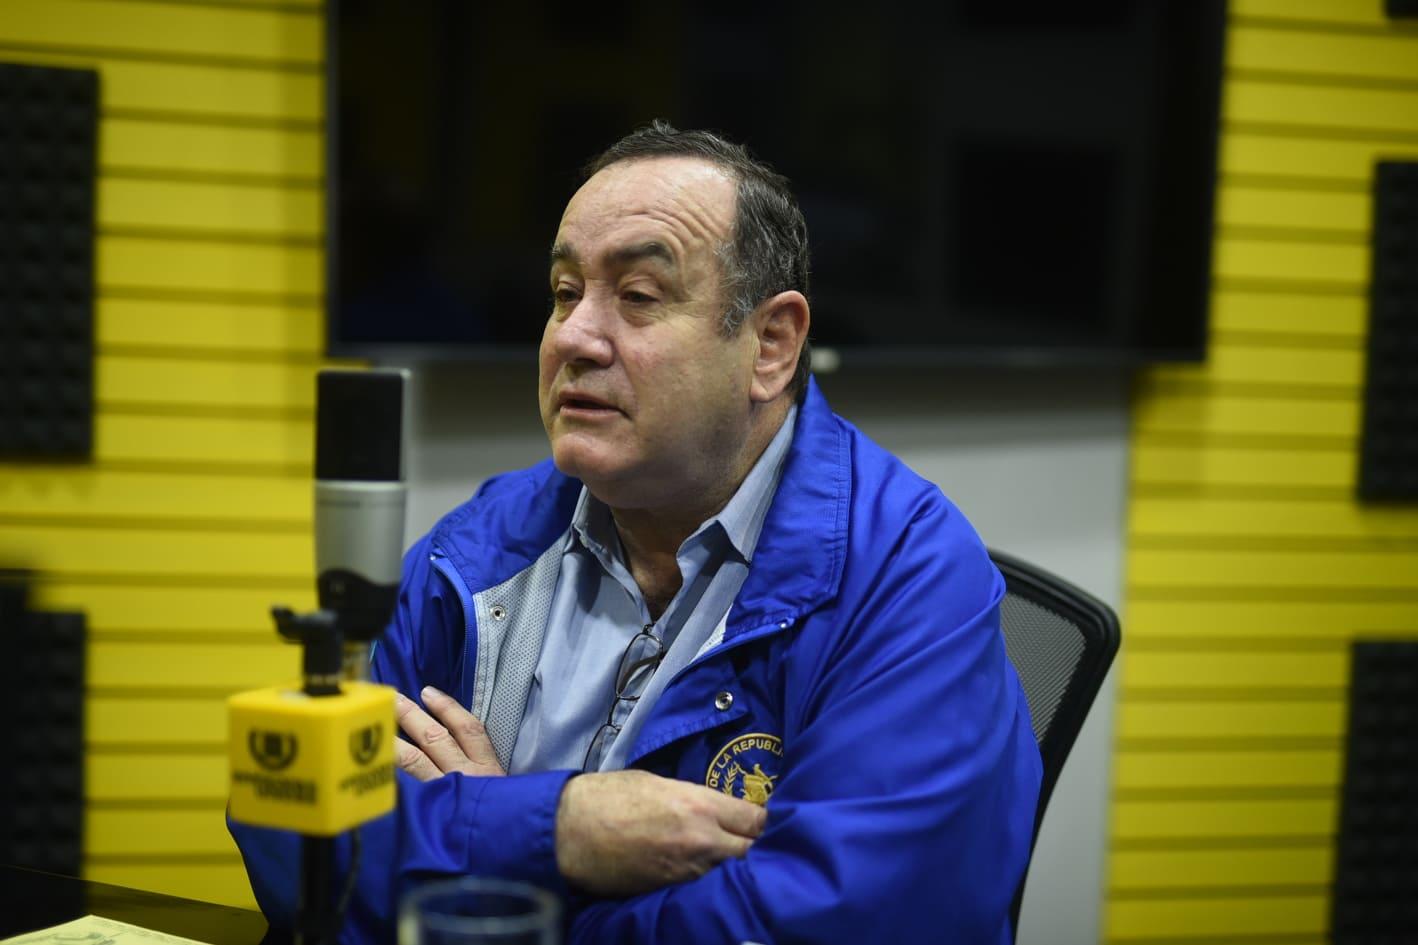 Presidente acusa a proveedores de oxígeno de querer extorsionarlo